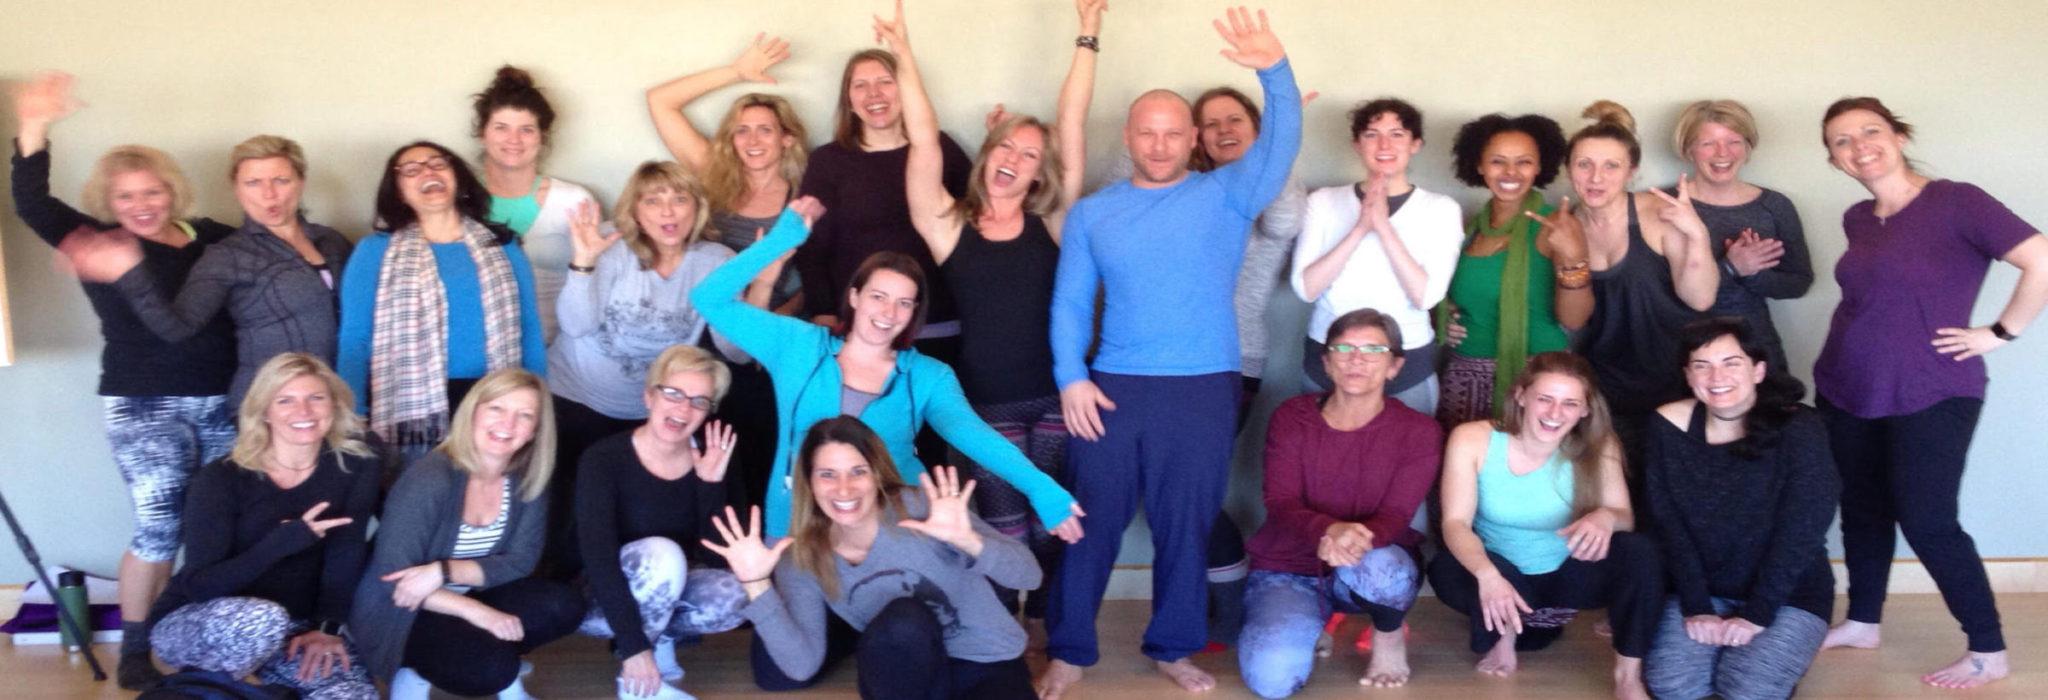 Pranalife Yoga Teacher Training with Asia Nelson yoga Waterloo Kitchener Guelph Cambridge Toronto